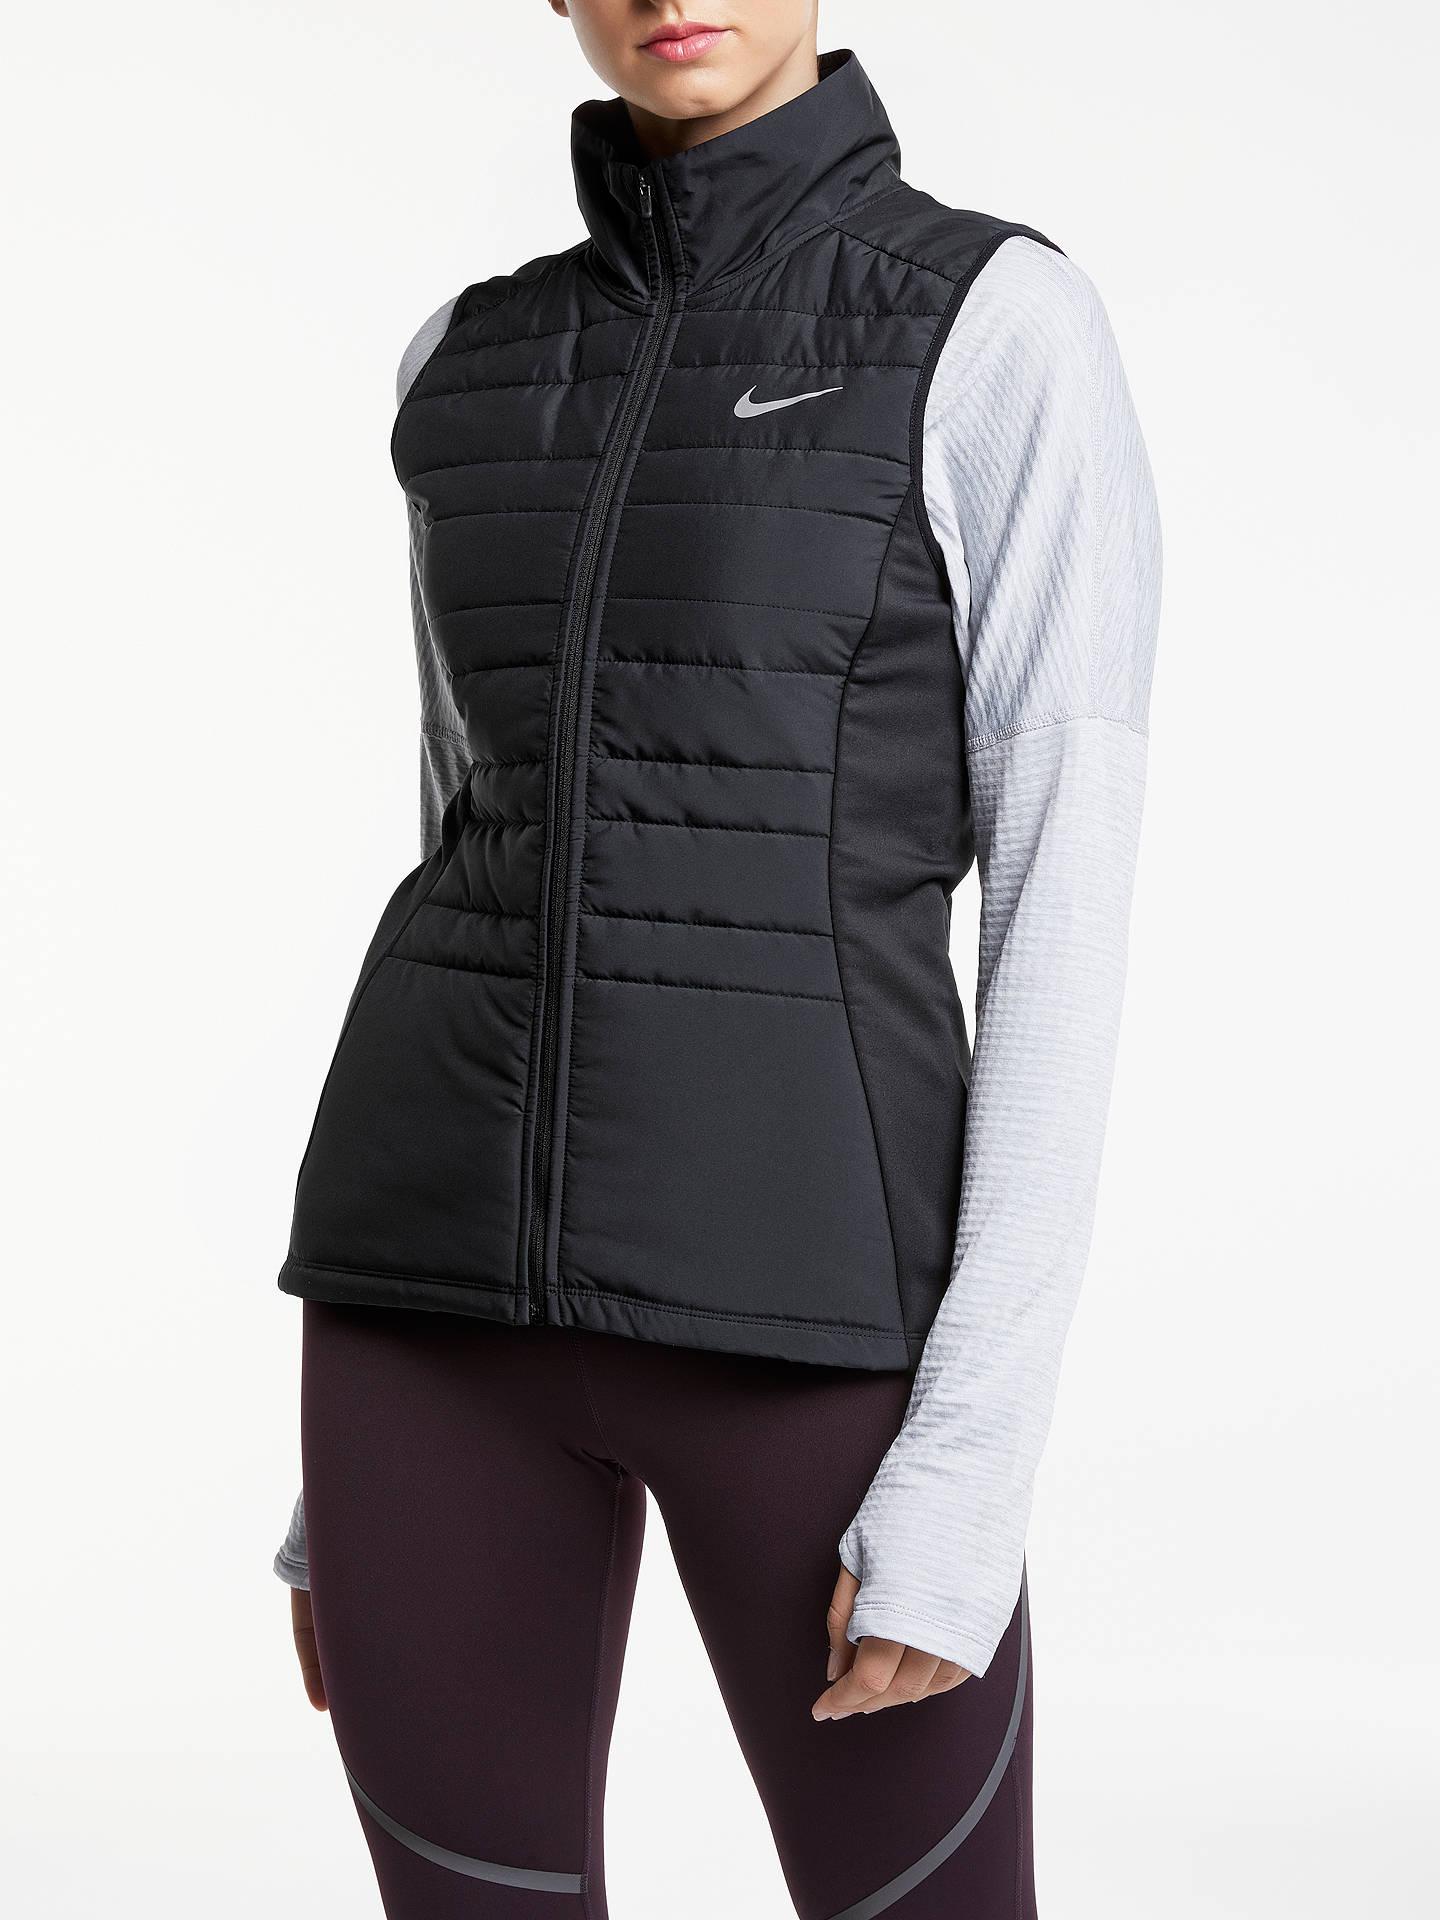 d5b979ad1 Nike Essential Running Zip Vest, Black/Metallic at John Lewis & Partners